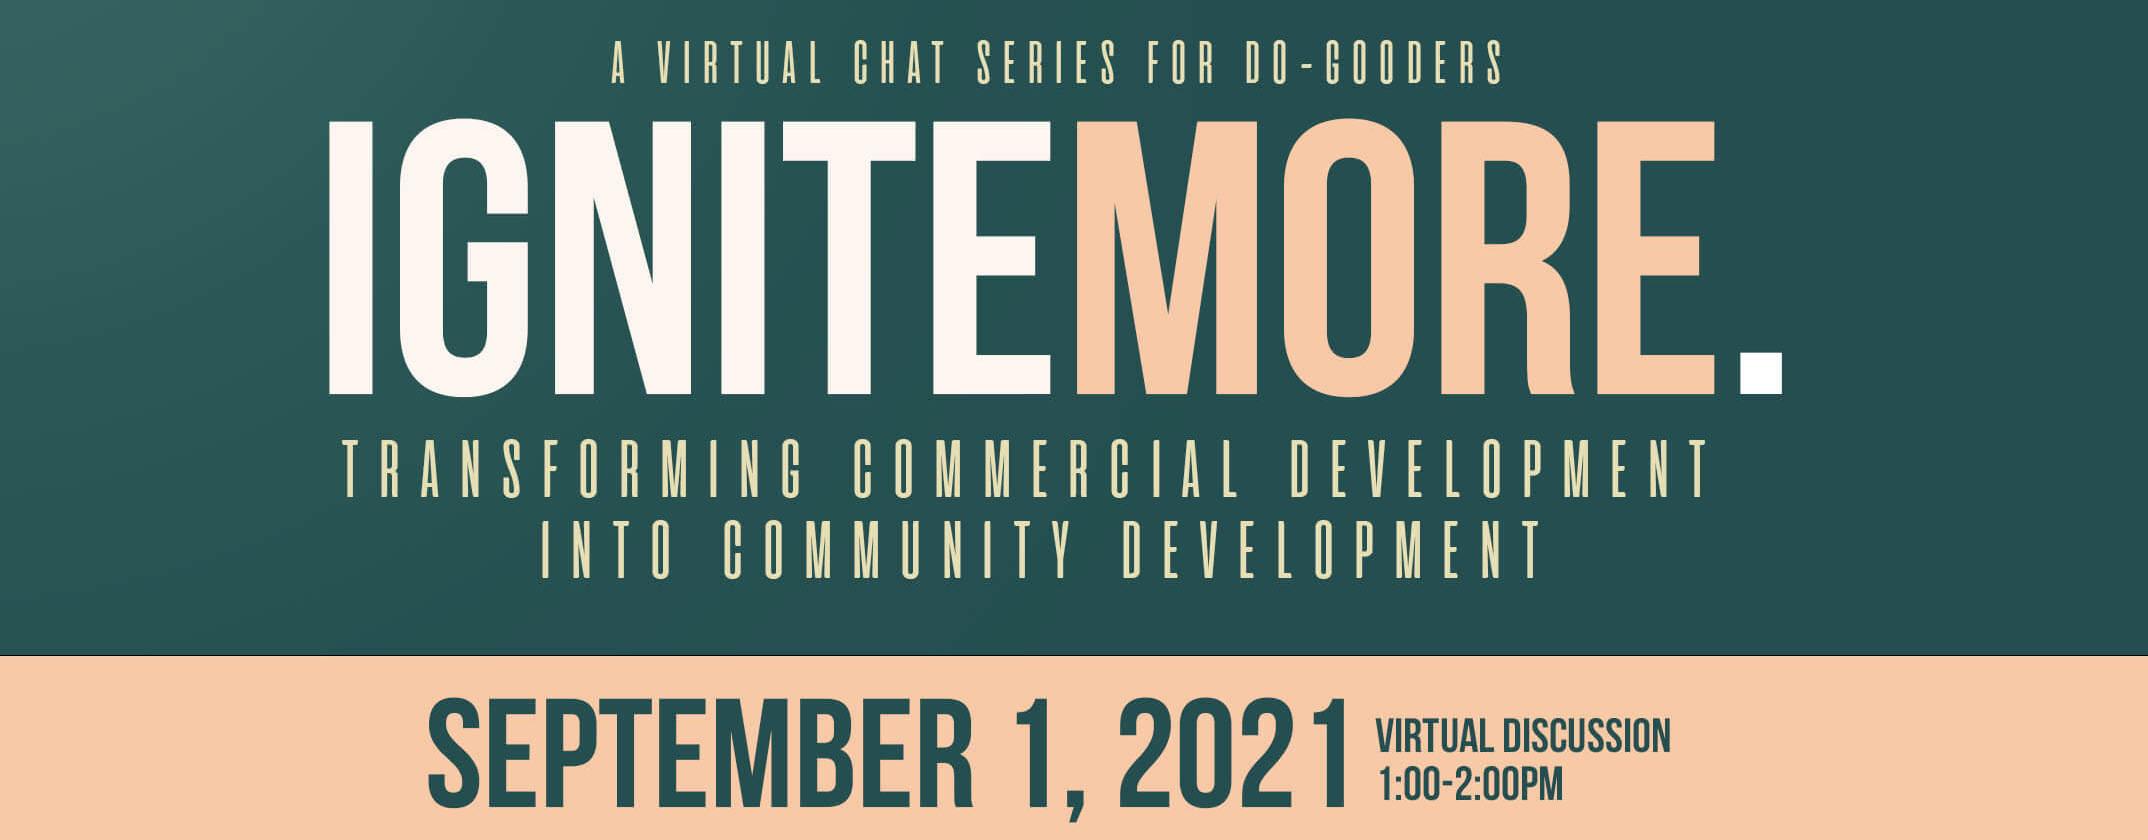 Transforming Commercial Development into Community Development